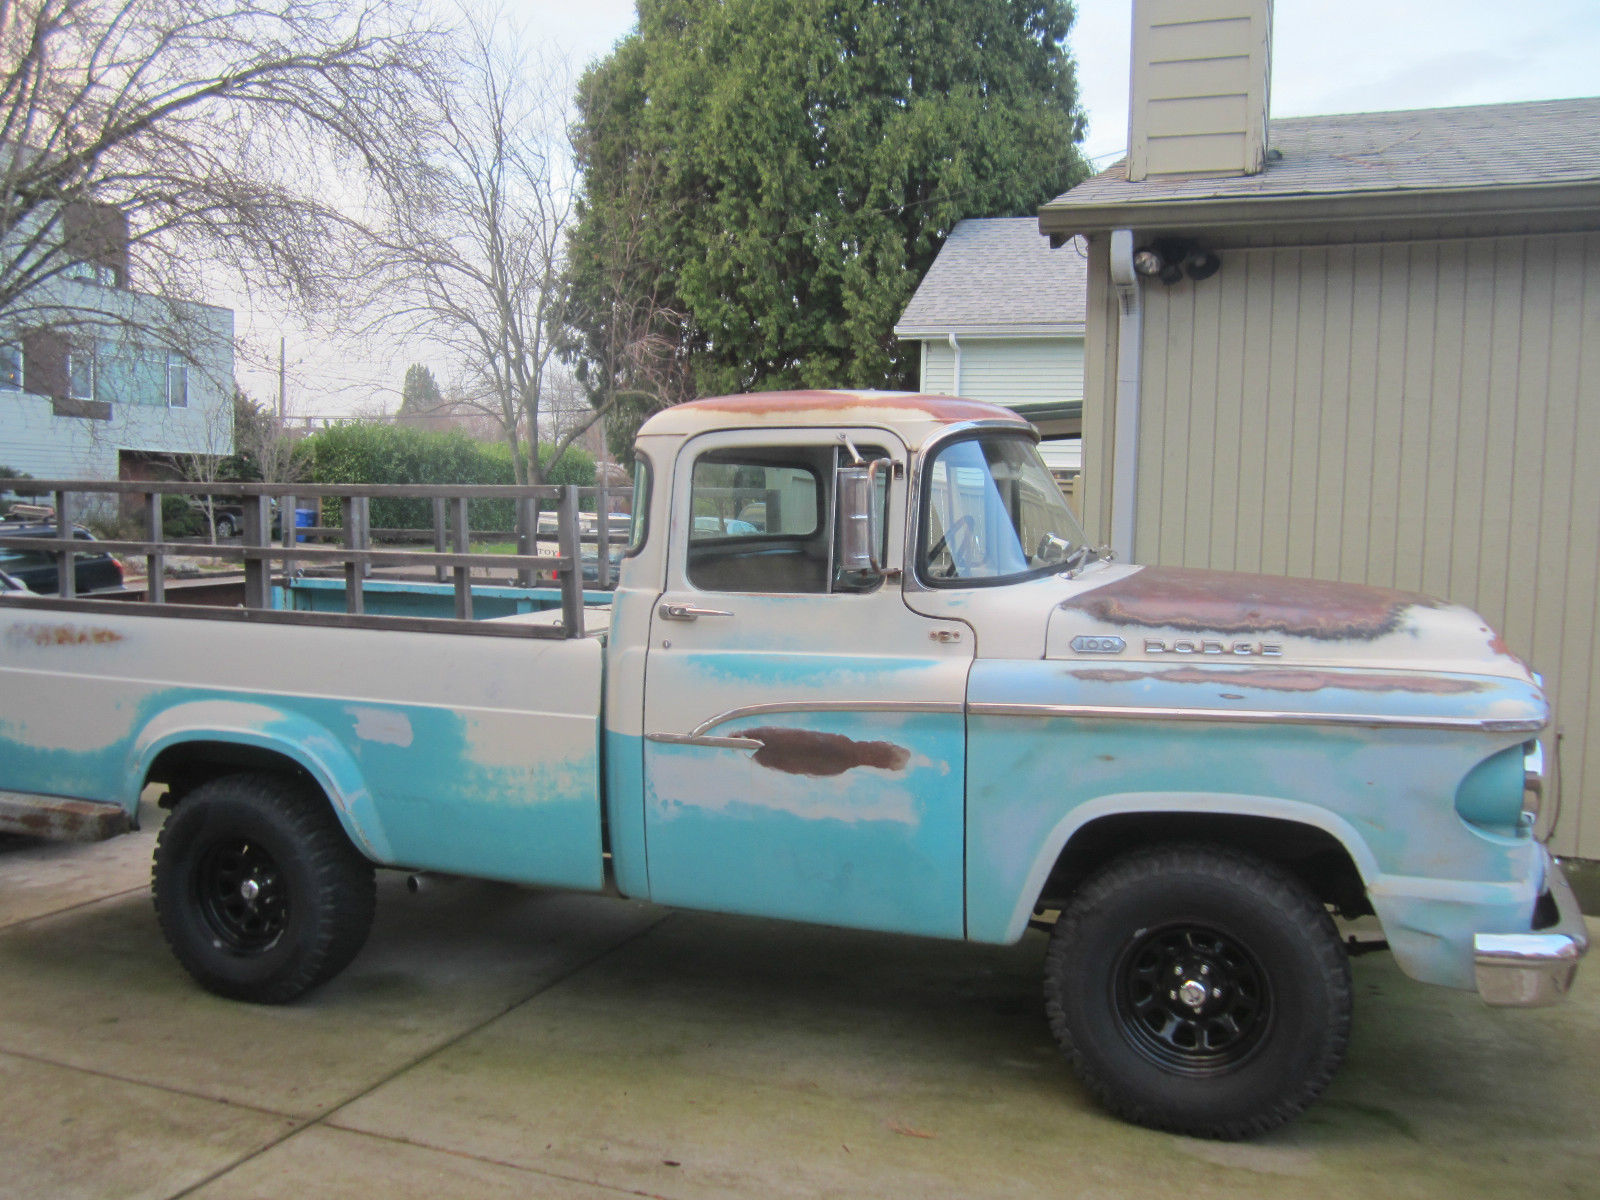 1960 classic dodge d100 pickup truck runs great for sale in portland oregon united states. Black Bedroom Furniture Sets. Home Design Ideas